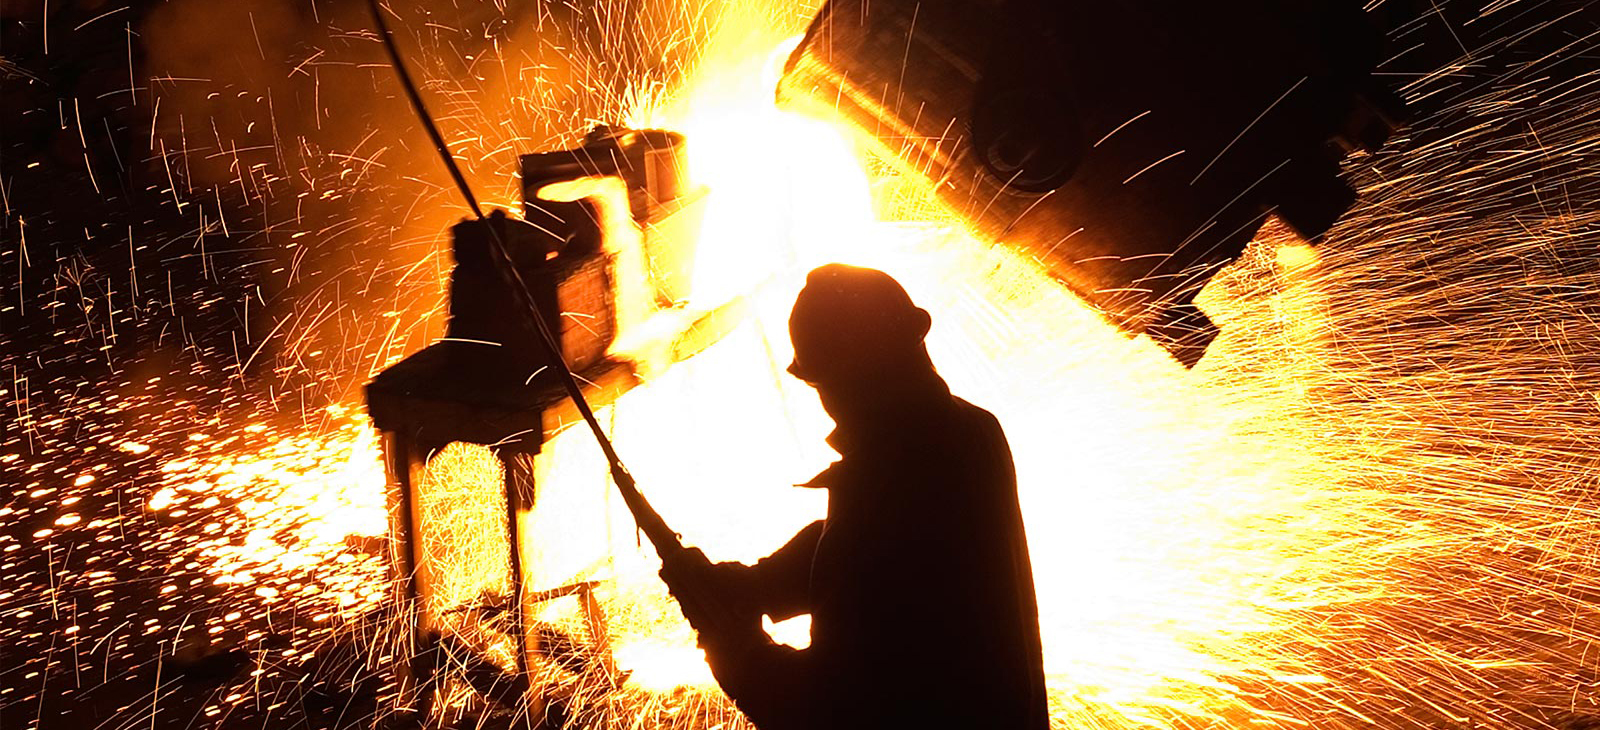 Struers manufacturing